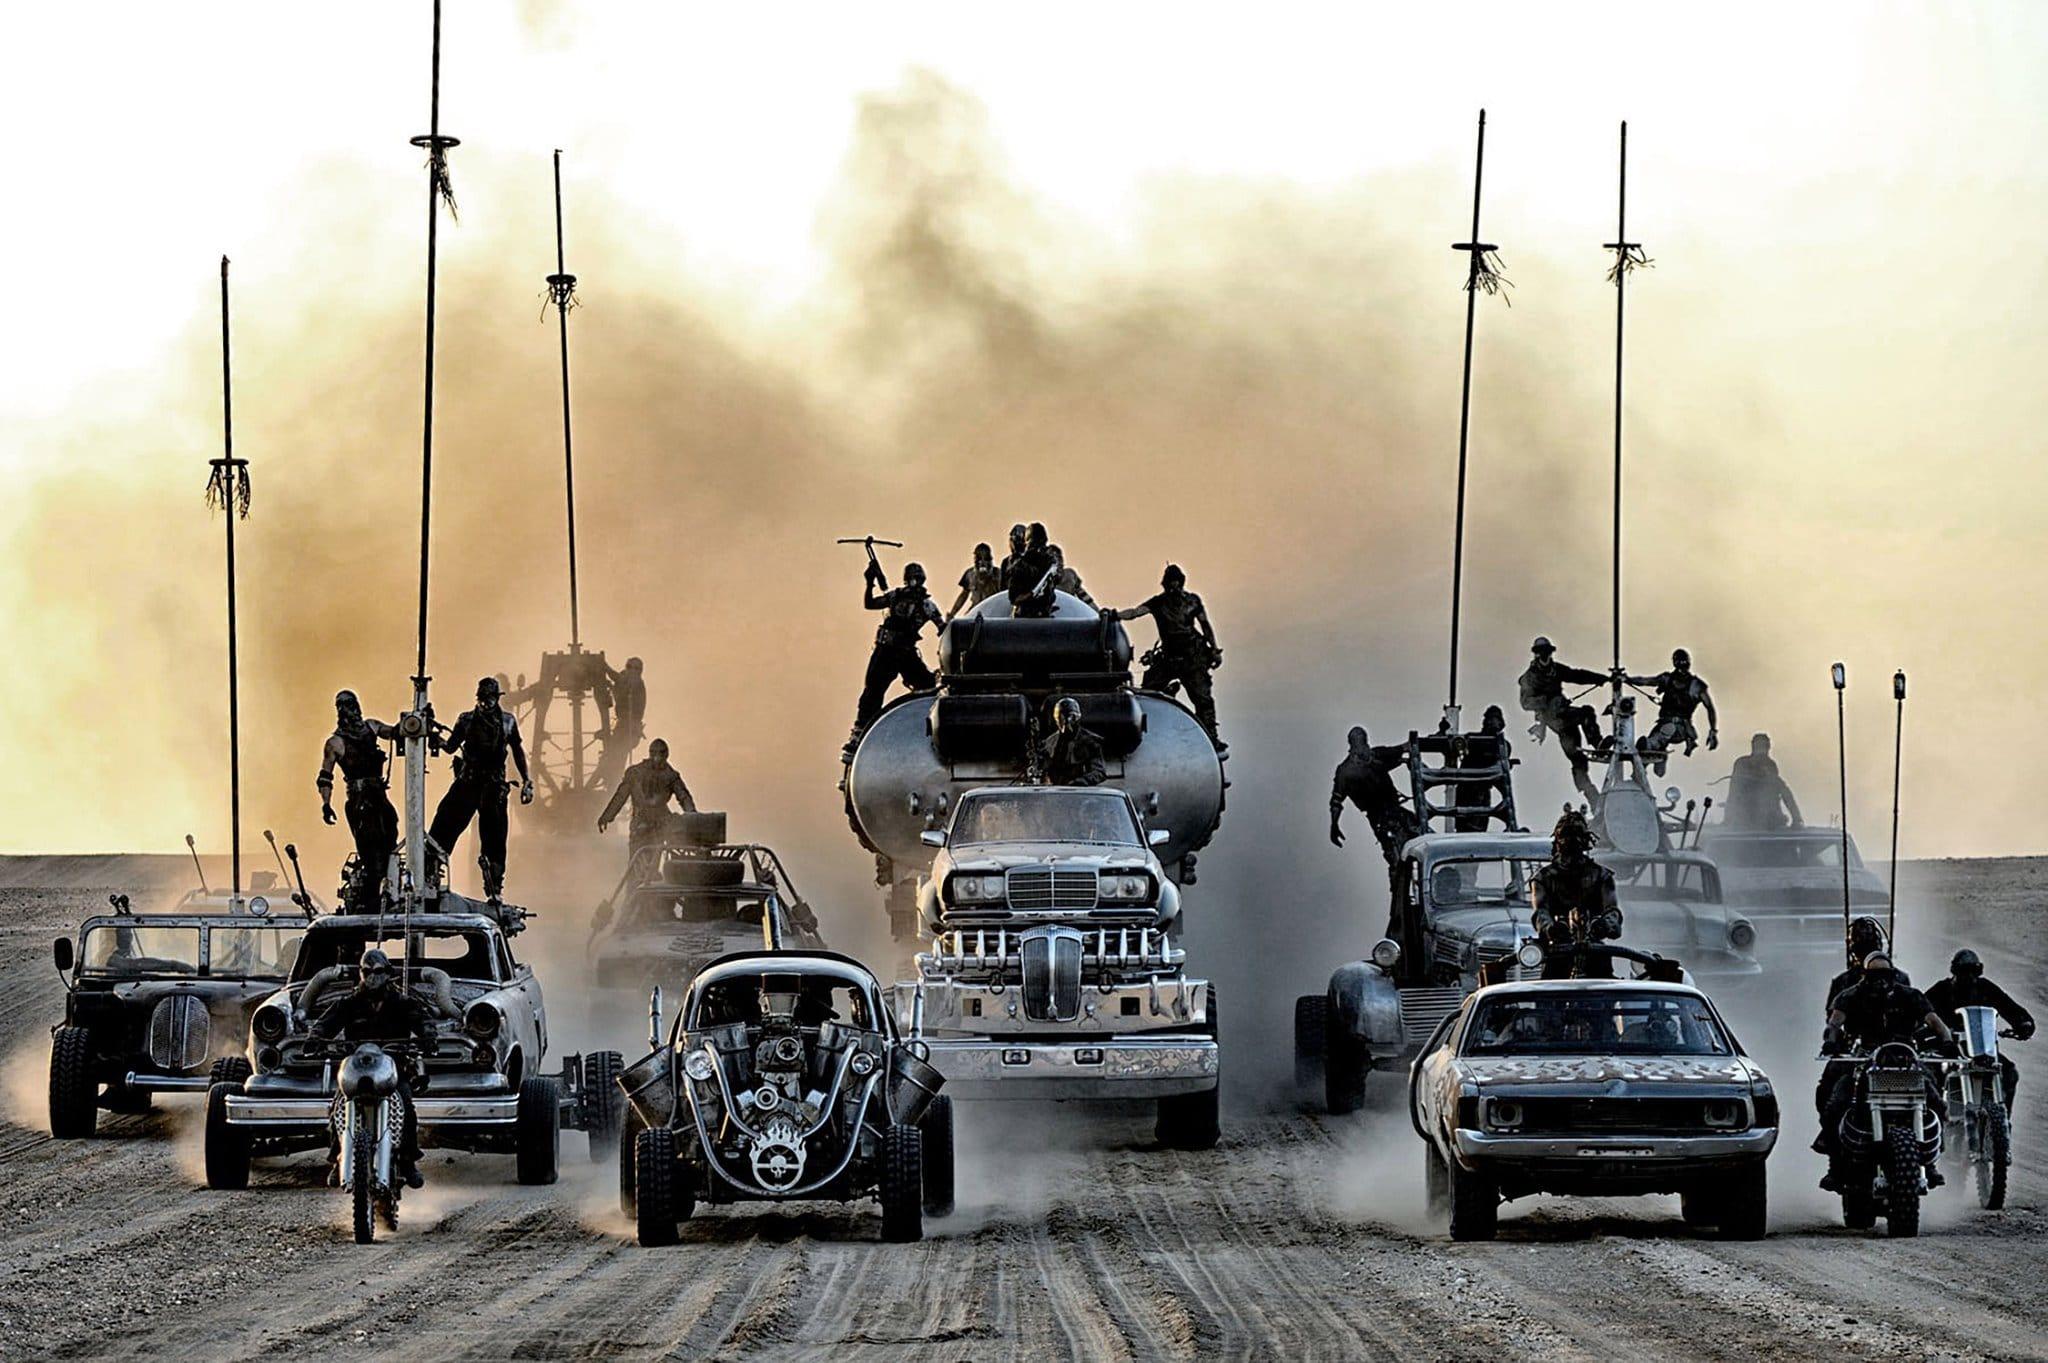 W123 Mercedes-Benz, 230E, 200, 280E, 230CE, 280CE, 200TE, 230TE, 280TE, mercedes, Mercedes-Benz, W123, Mercedes W123, luxury car, motoring, automotive, car, cars, classic car, retro car, old car, vintage car, Mad Max, tough car, project car, motoring, automotive, car, car, carandclassic, ebay, ebay motors, autotrader, Motoring Research